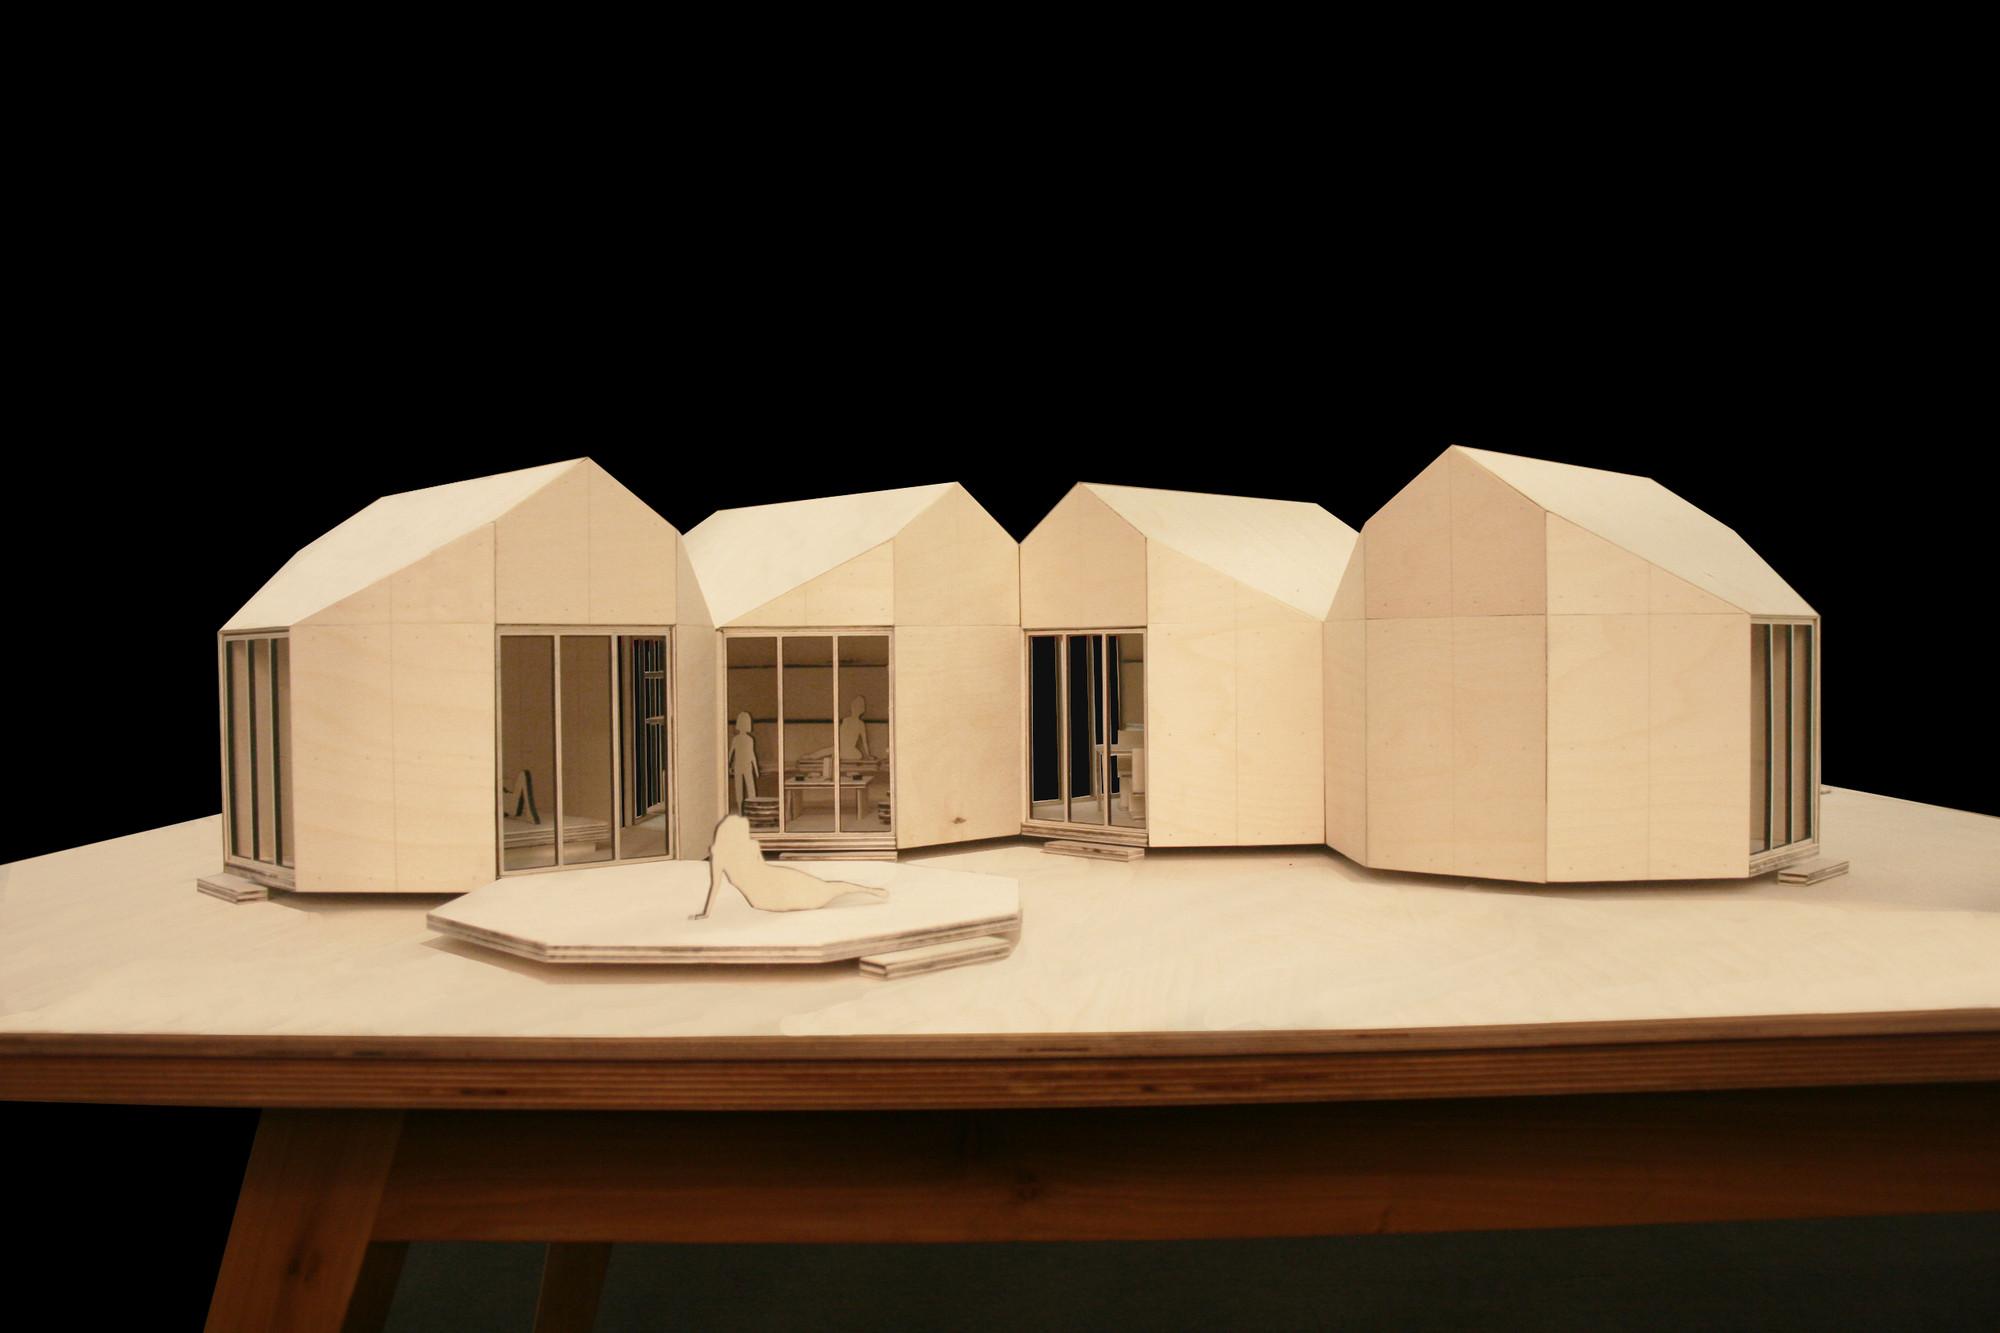 Prefabricacion tag plataforma arquitectura for Arquitectura casa